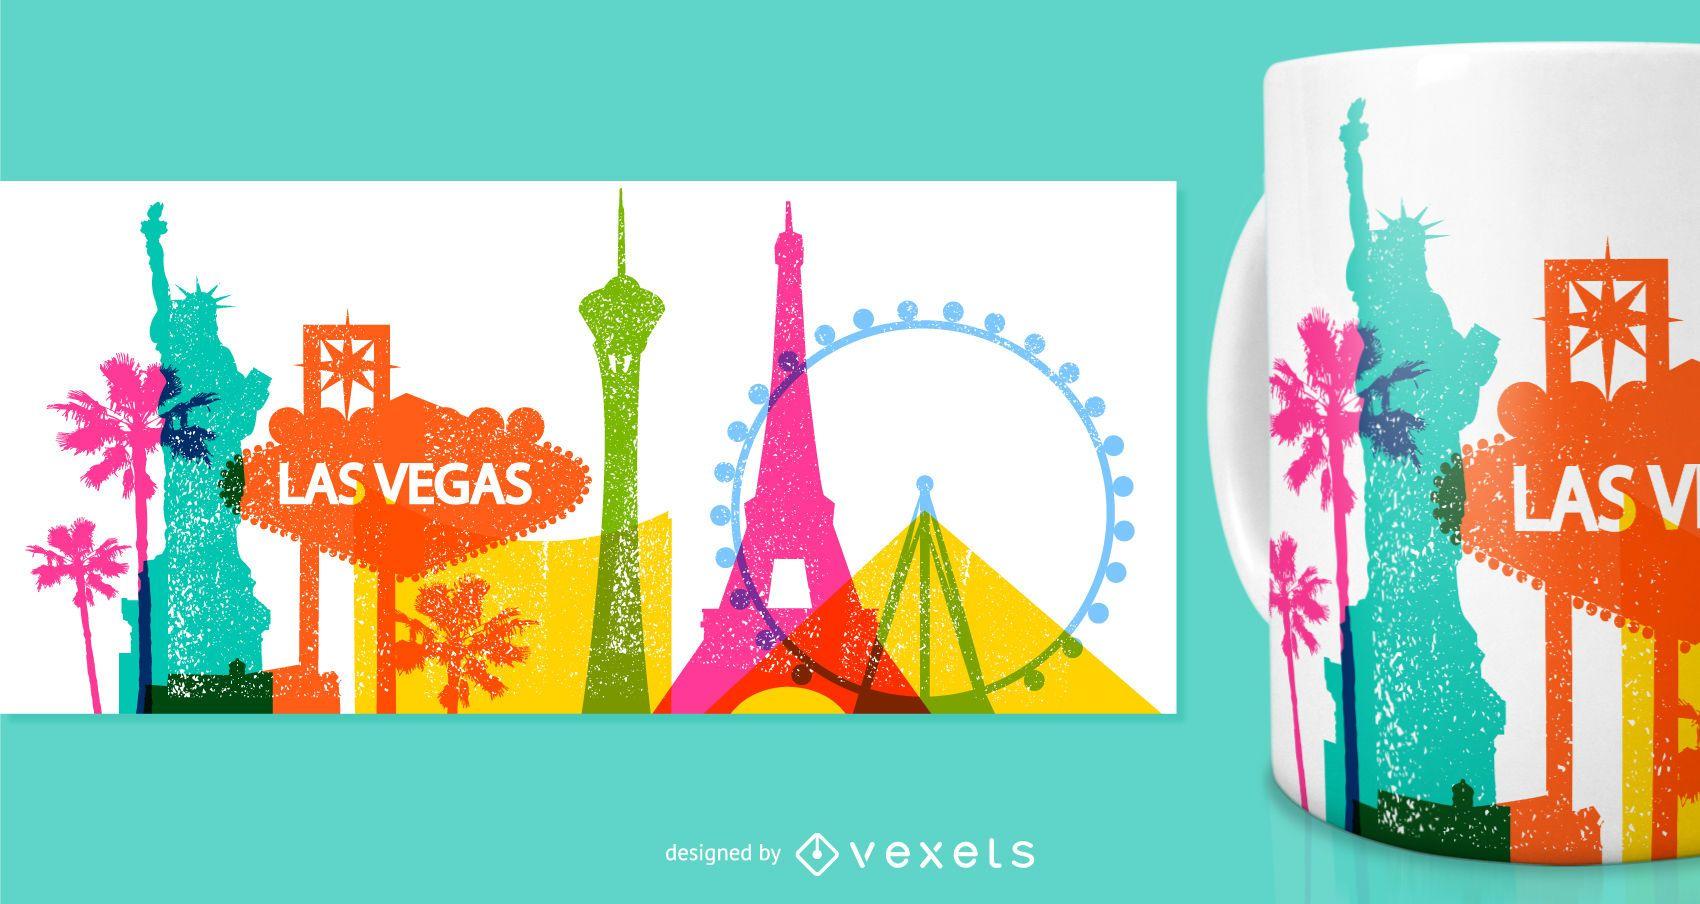 Las Vegas Merchandise Becher Design